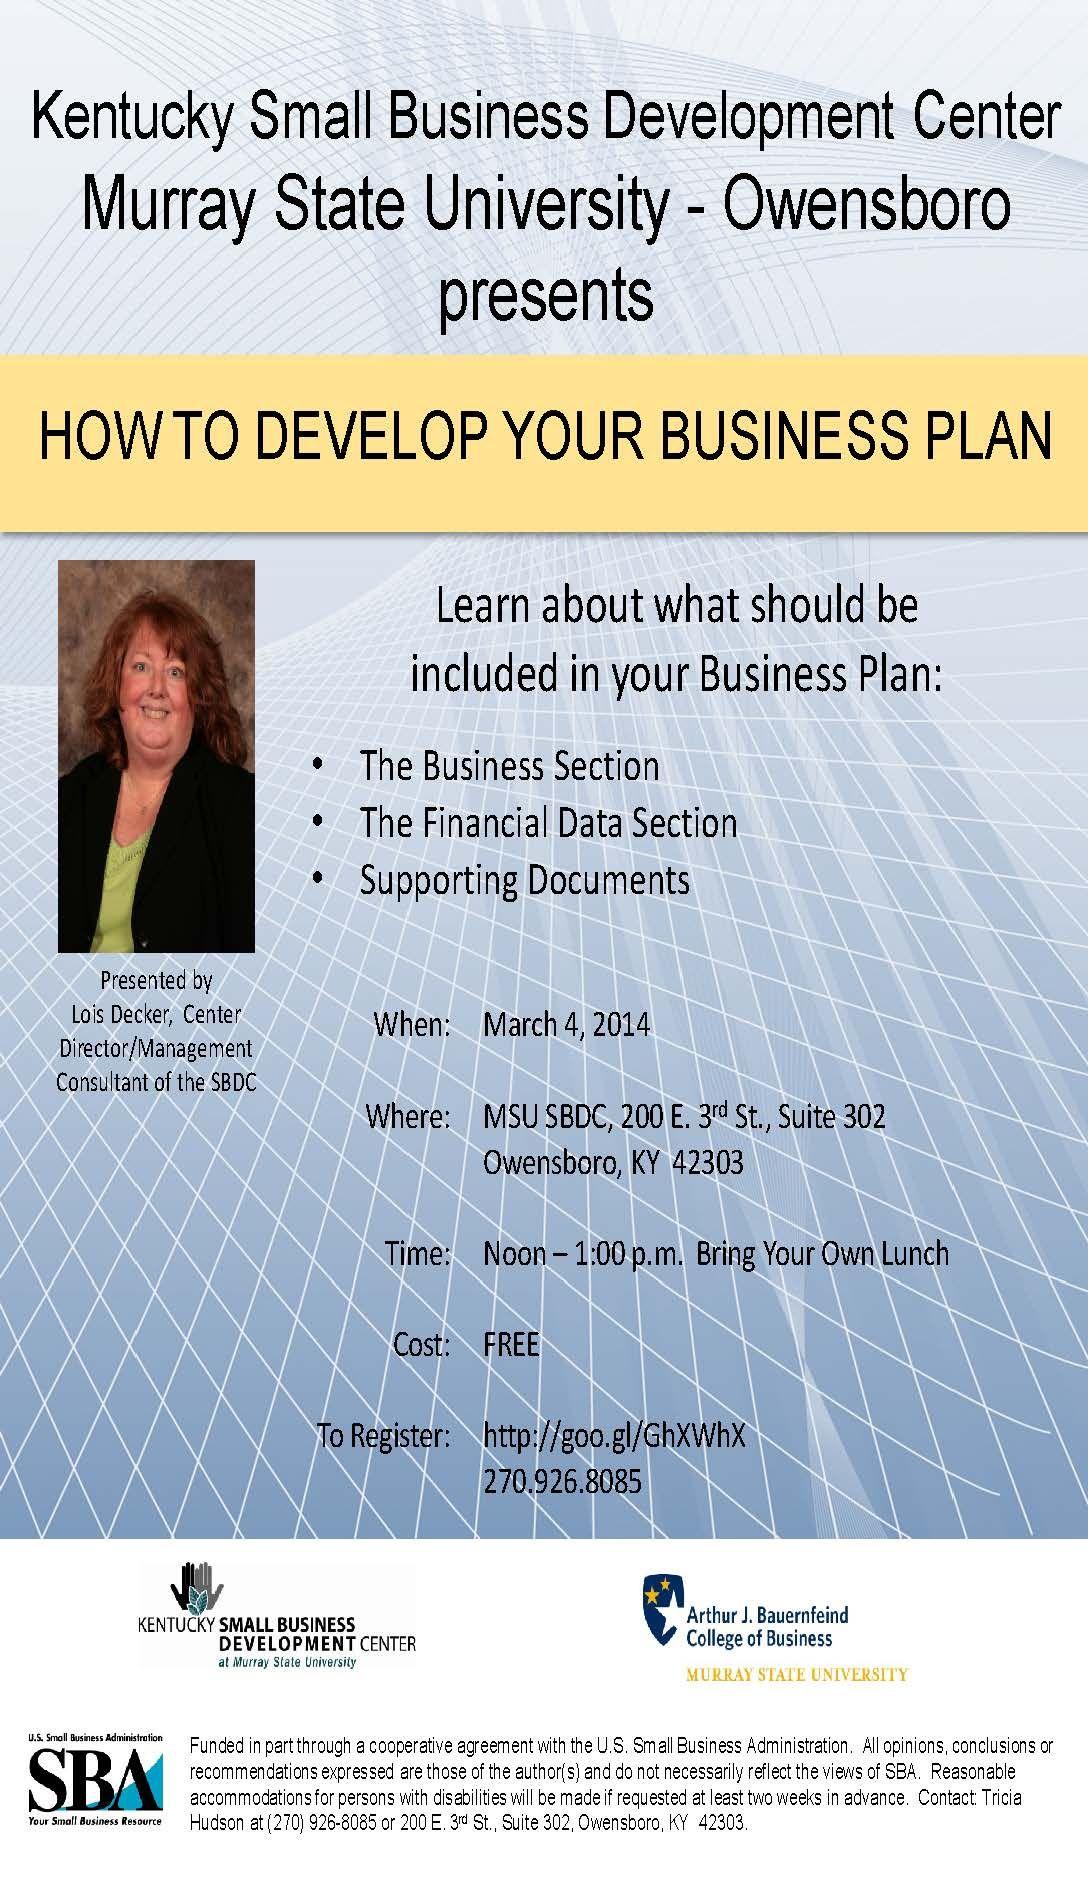 #training #MSUSBDC #businessplan